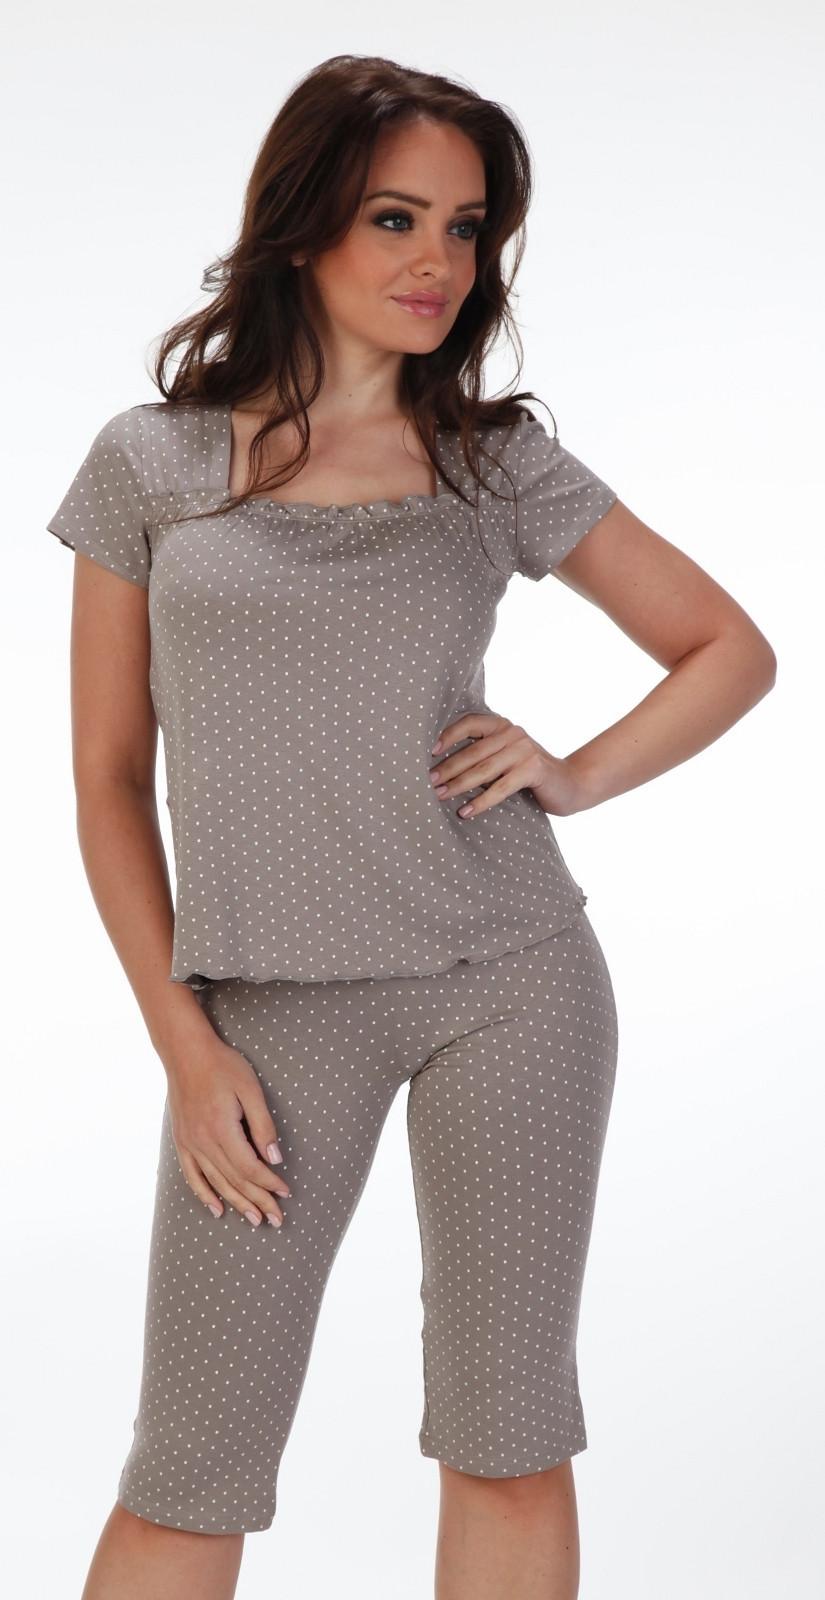 Pyžamo Forex Puntíky 919 Barva: šedá, Velikost: XL